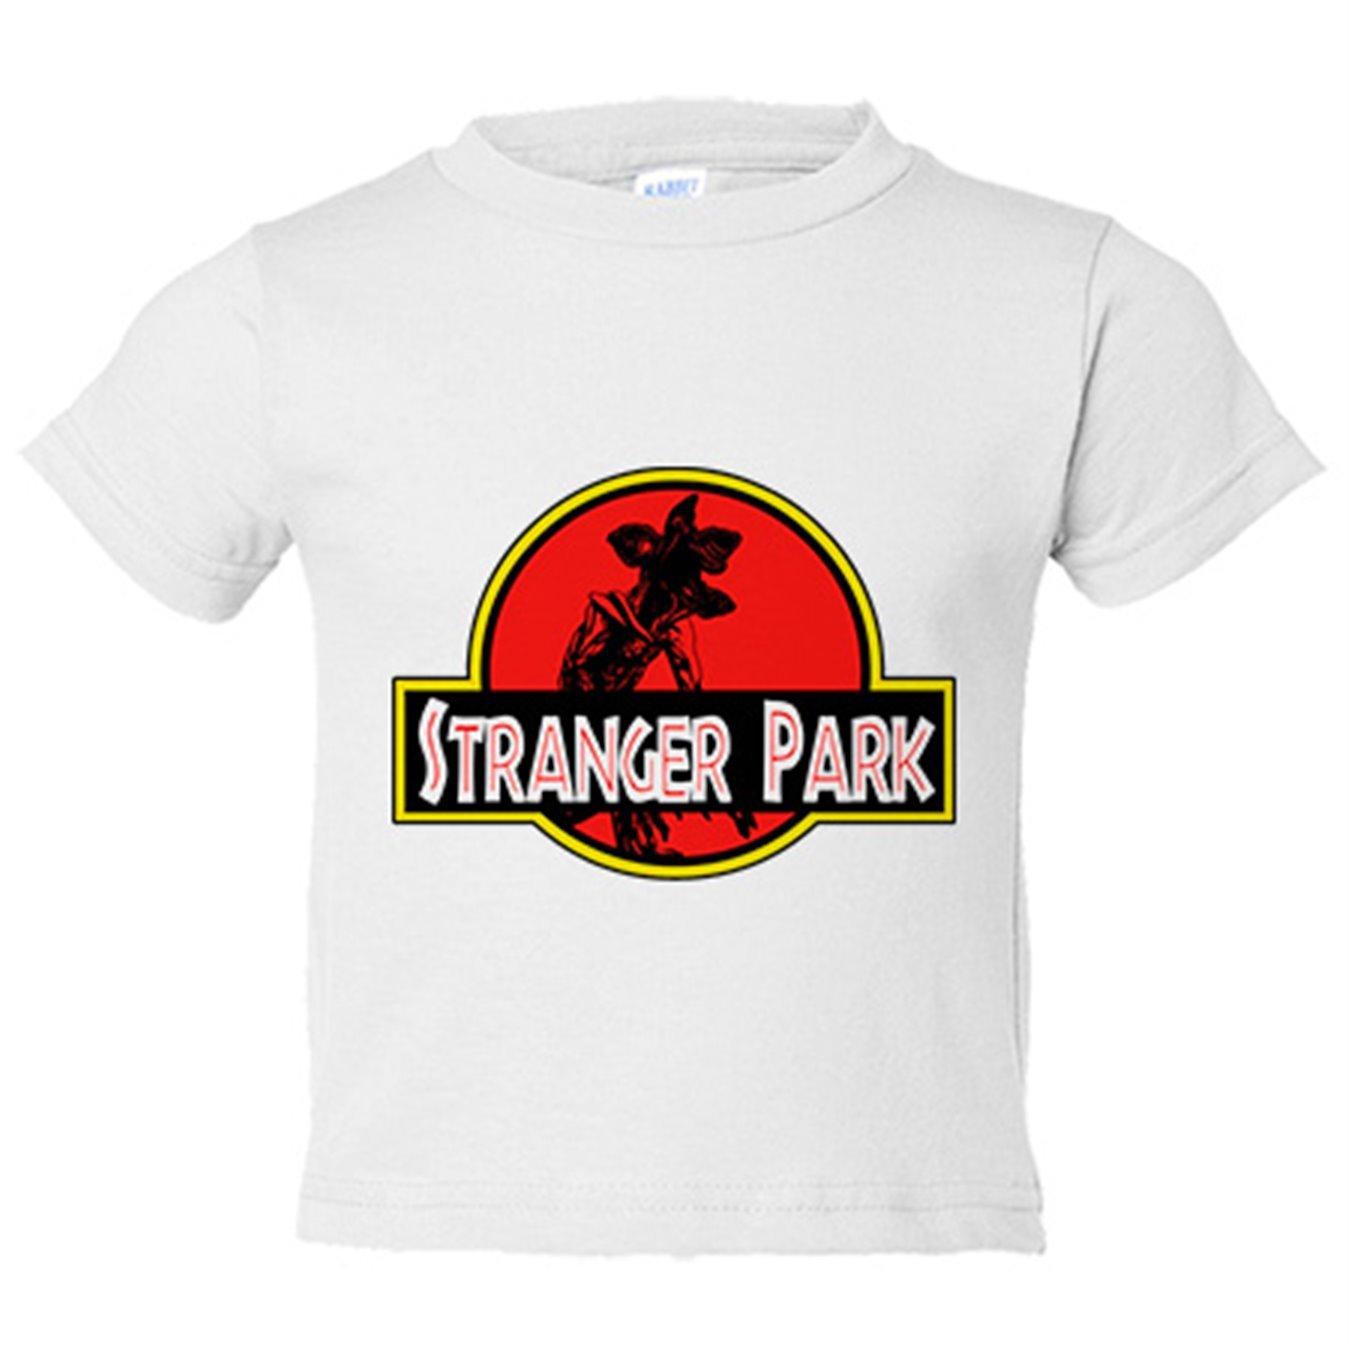 Camiseta niño Stranger Things Stranger Park Jurassic Park - Amarillo, 3-4 años: Amazon.es: Bebé